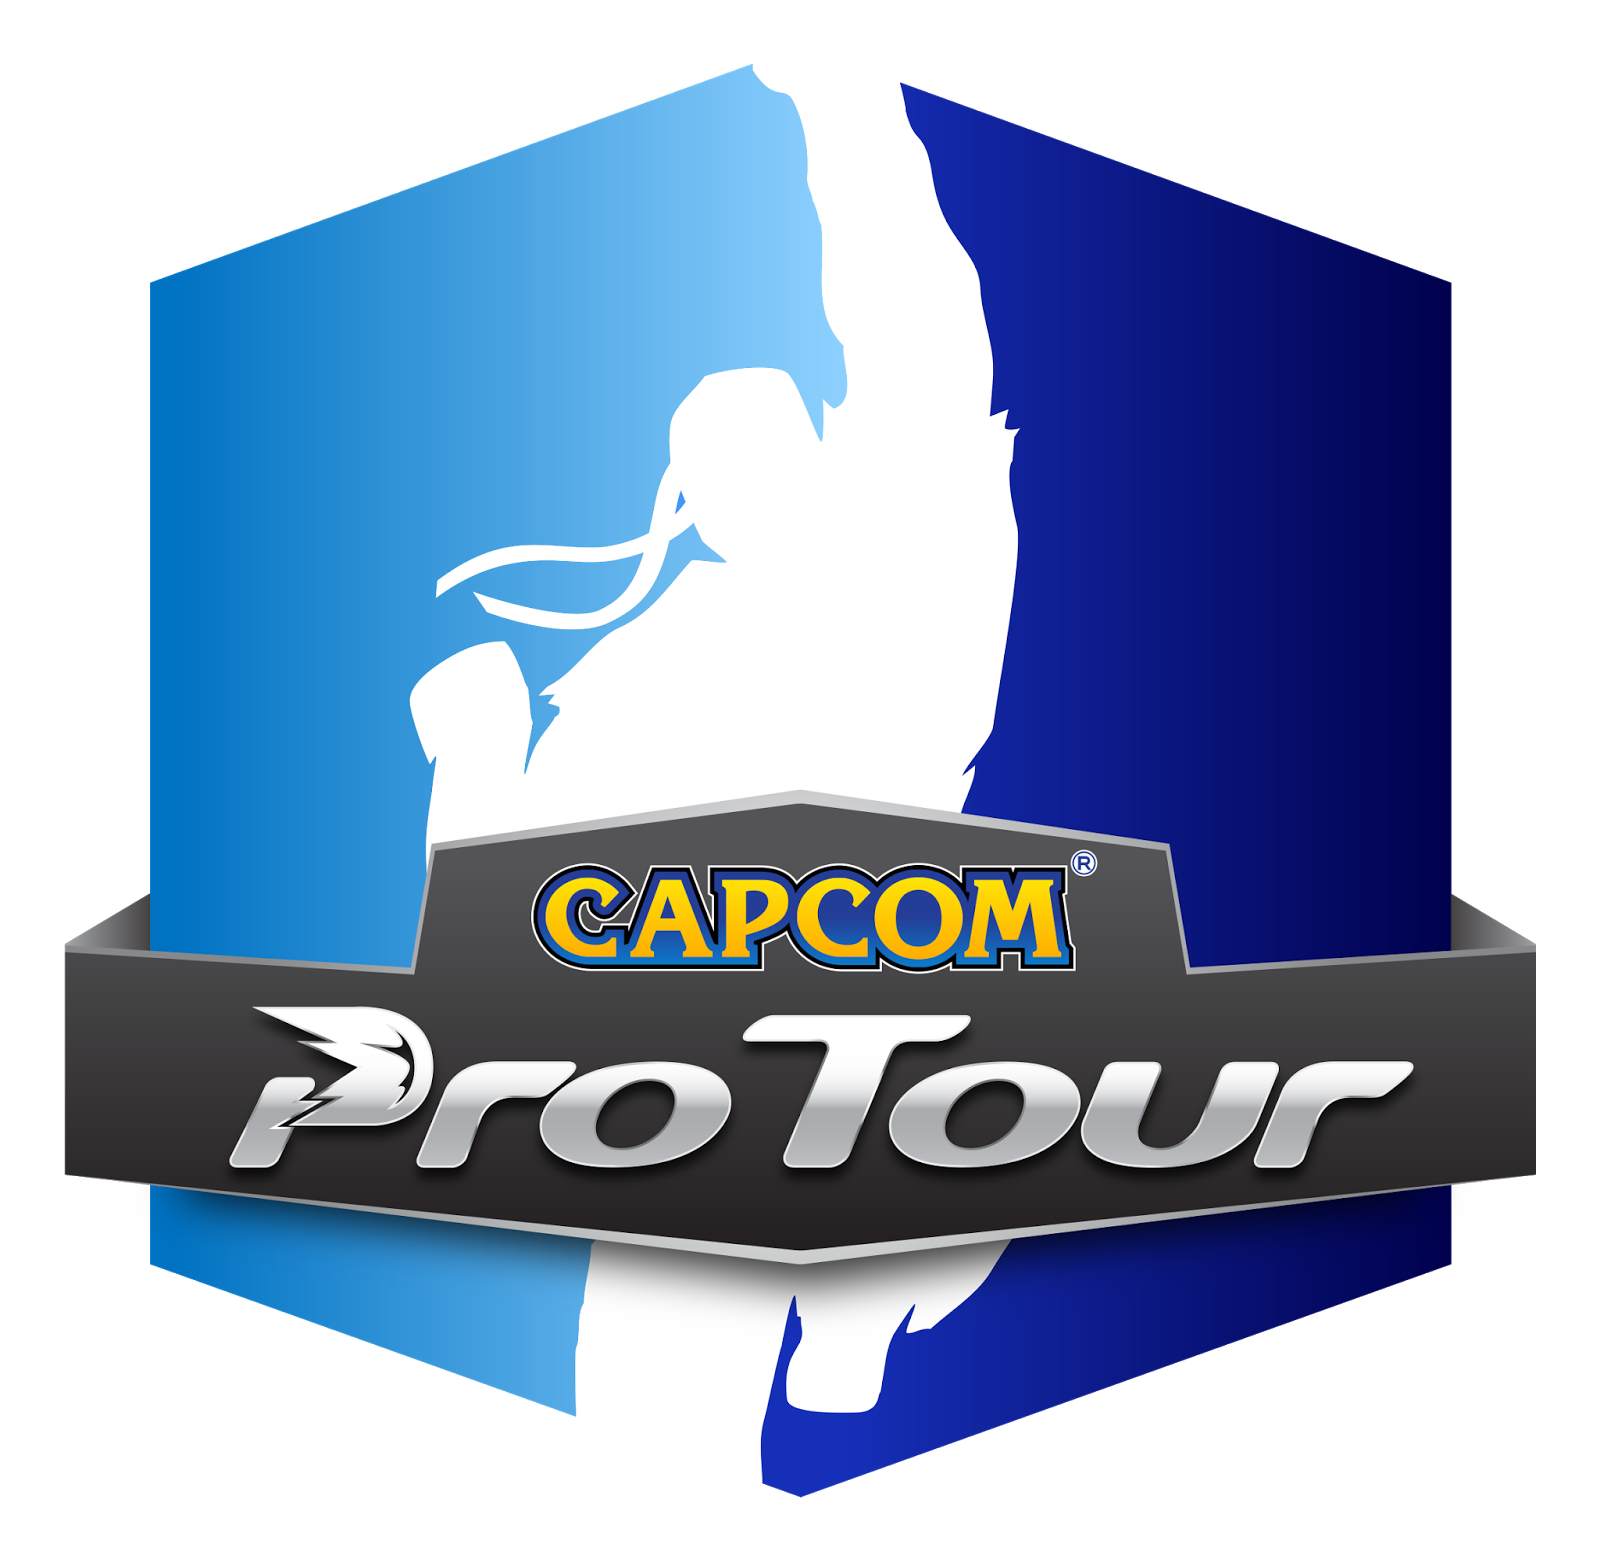 Tournament Street Fighter Twitch Capcom premier events league fighting